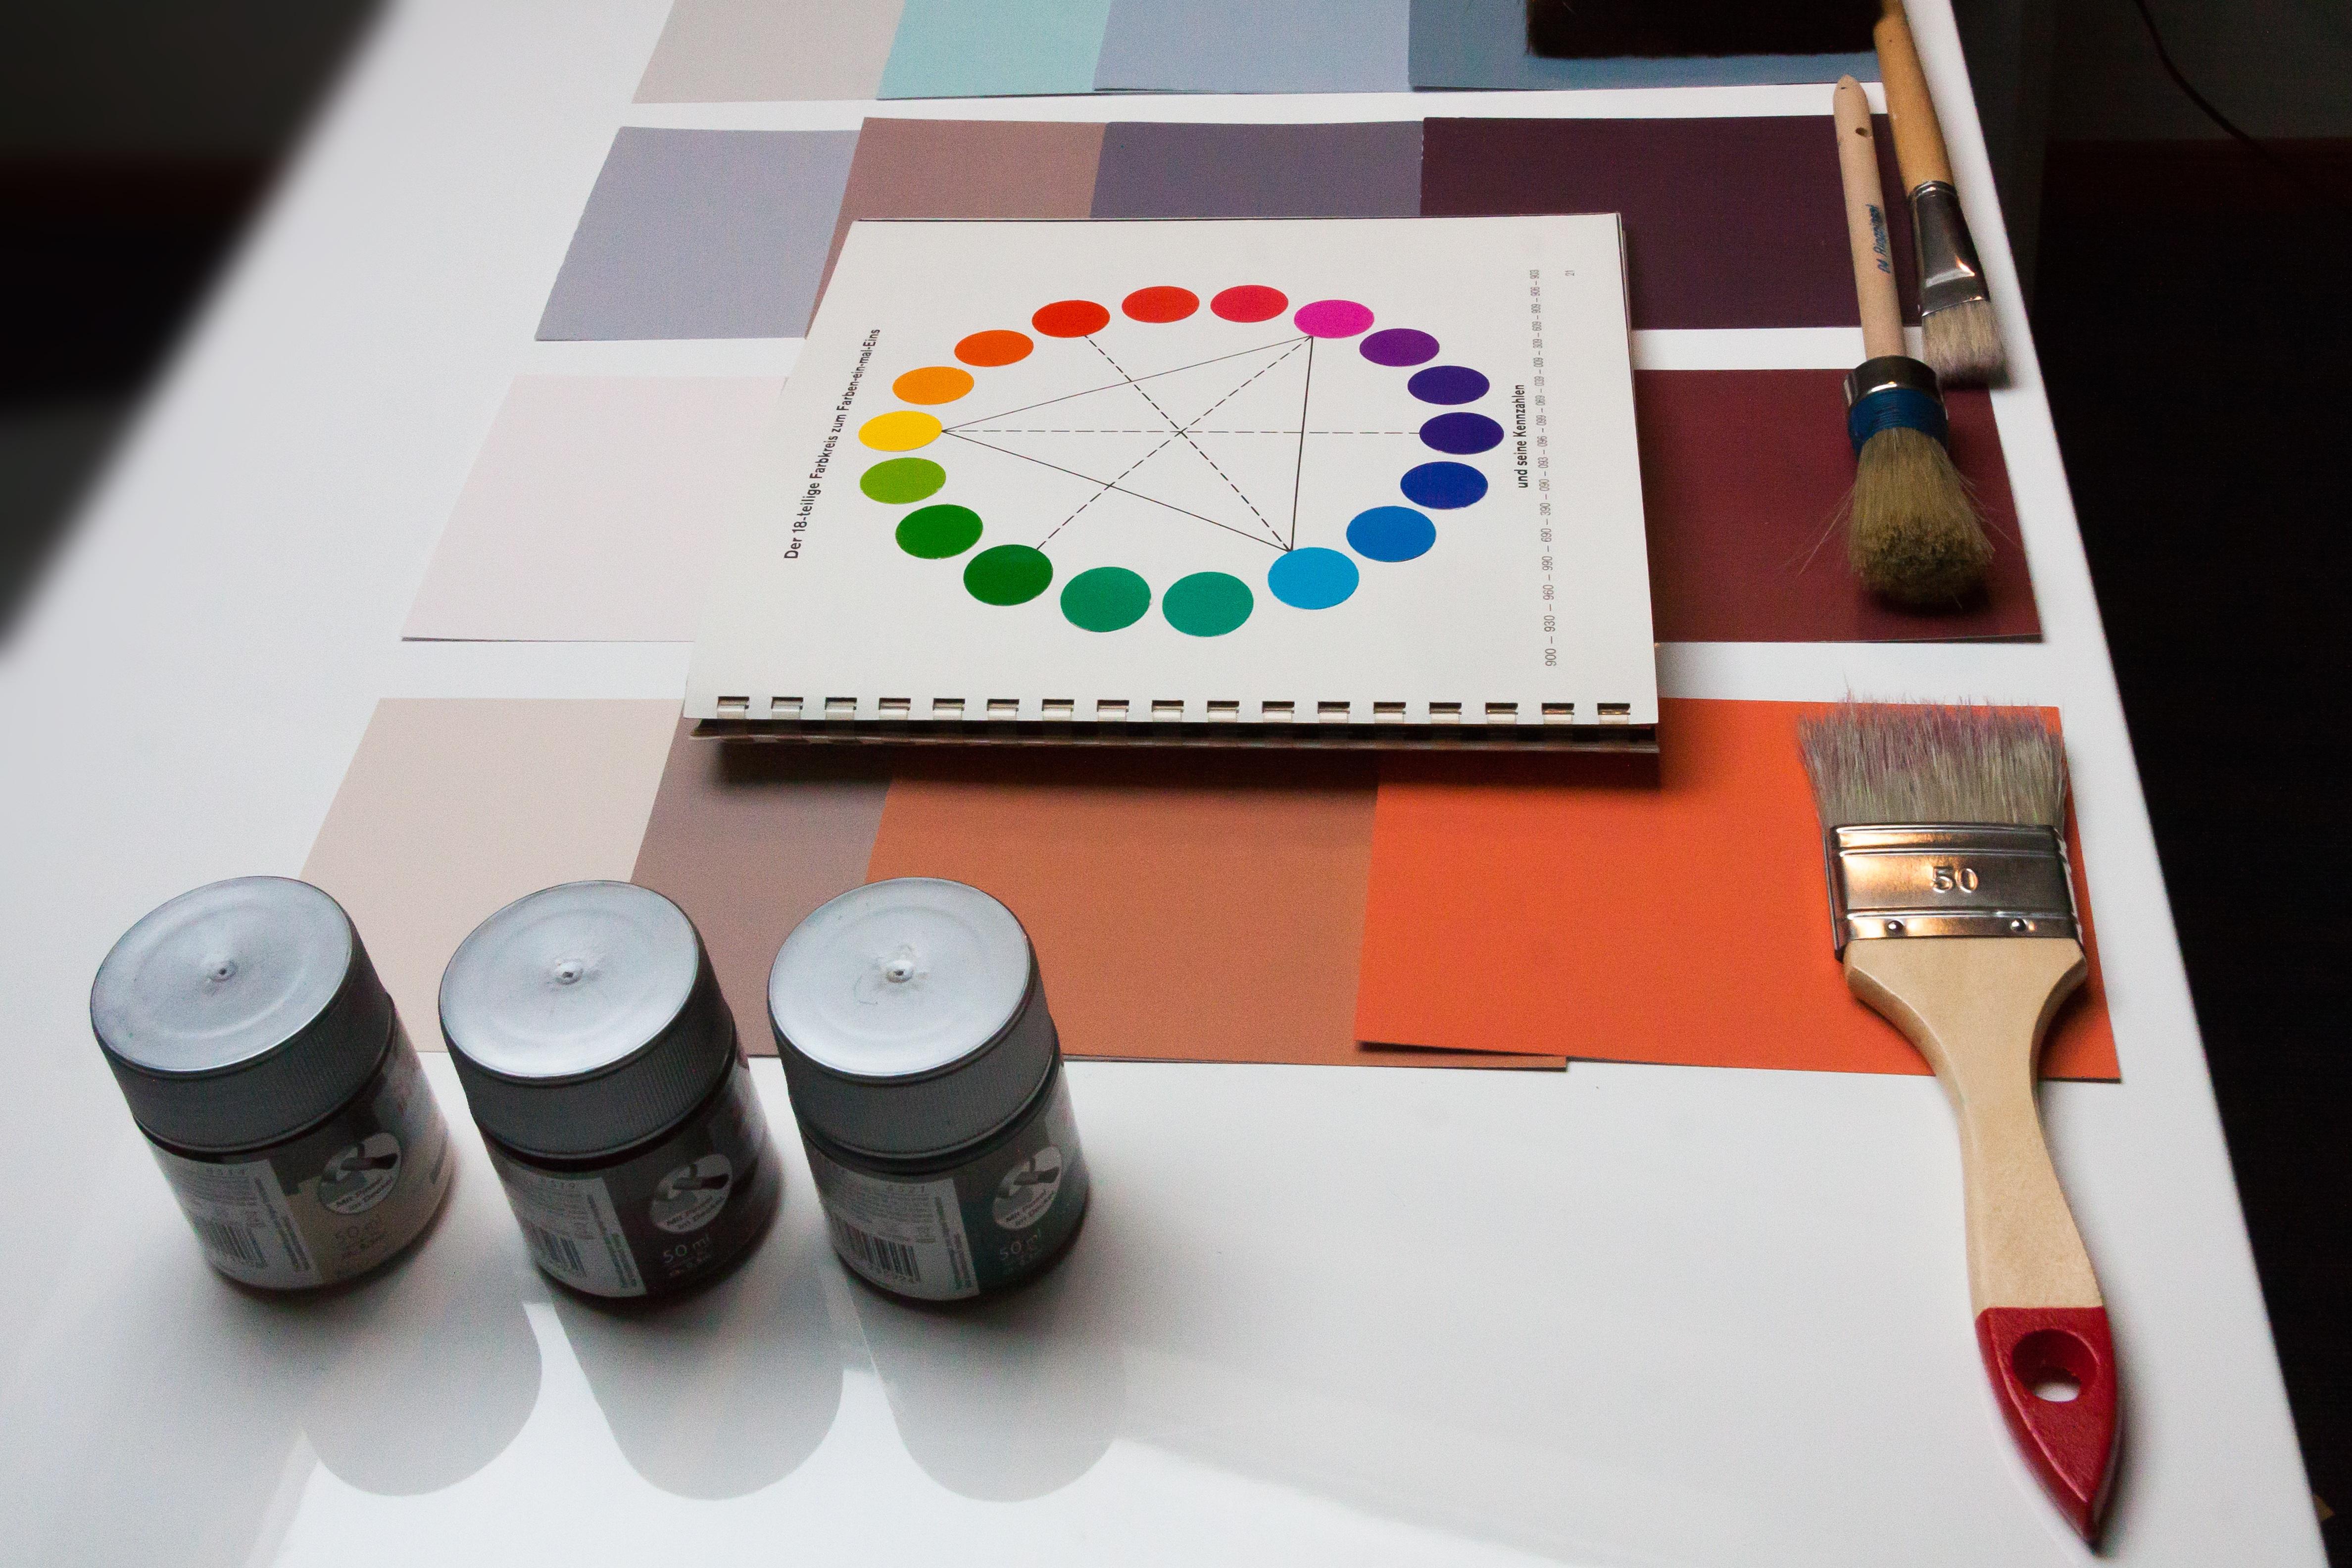 Innenarchitektur Lehre kostenlose foto tabelle bürste farbe material innenarchitektur